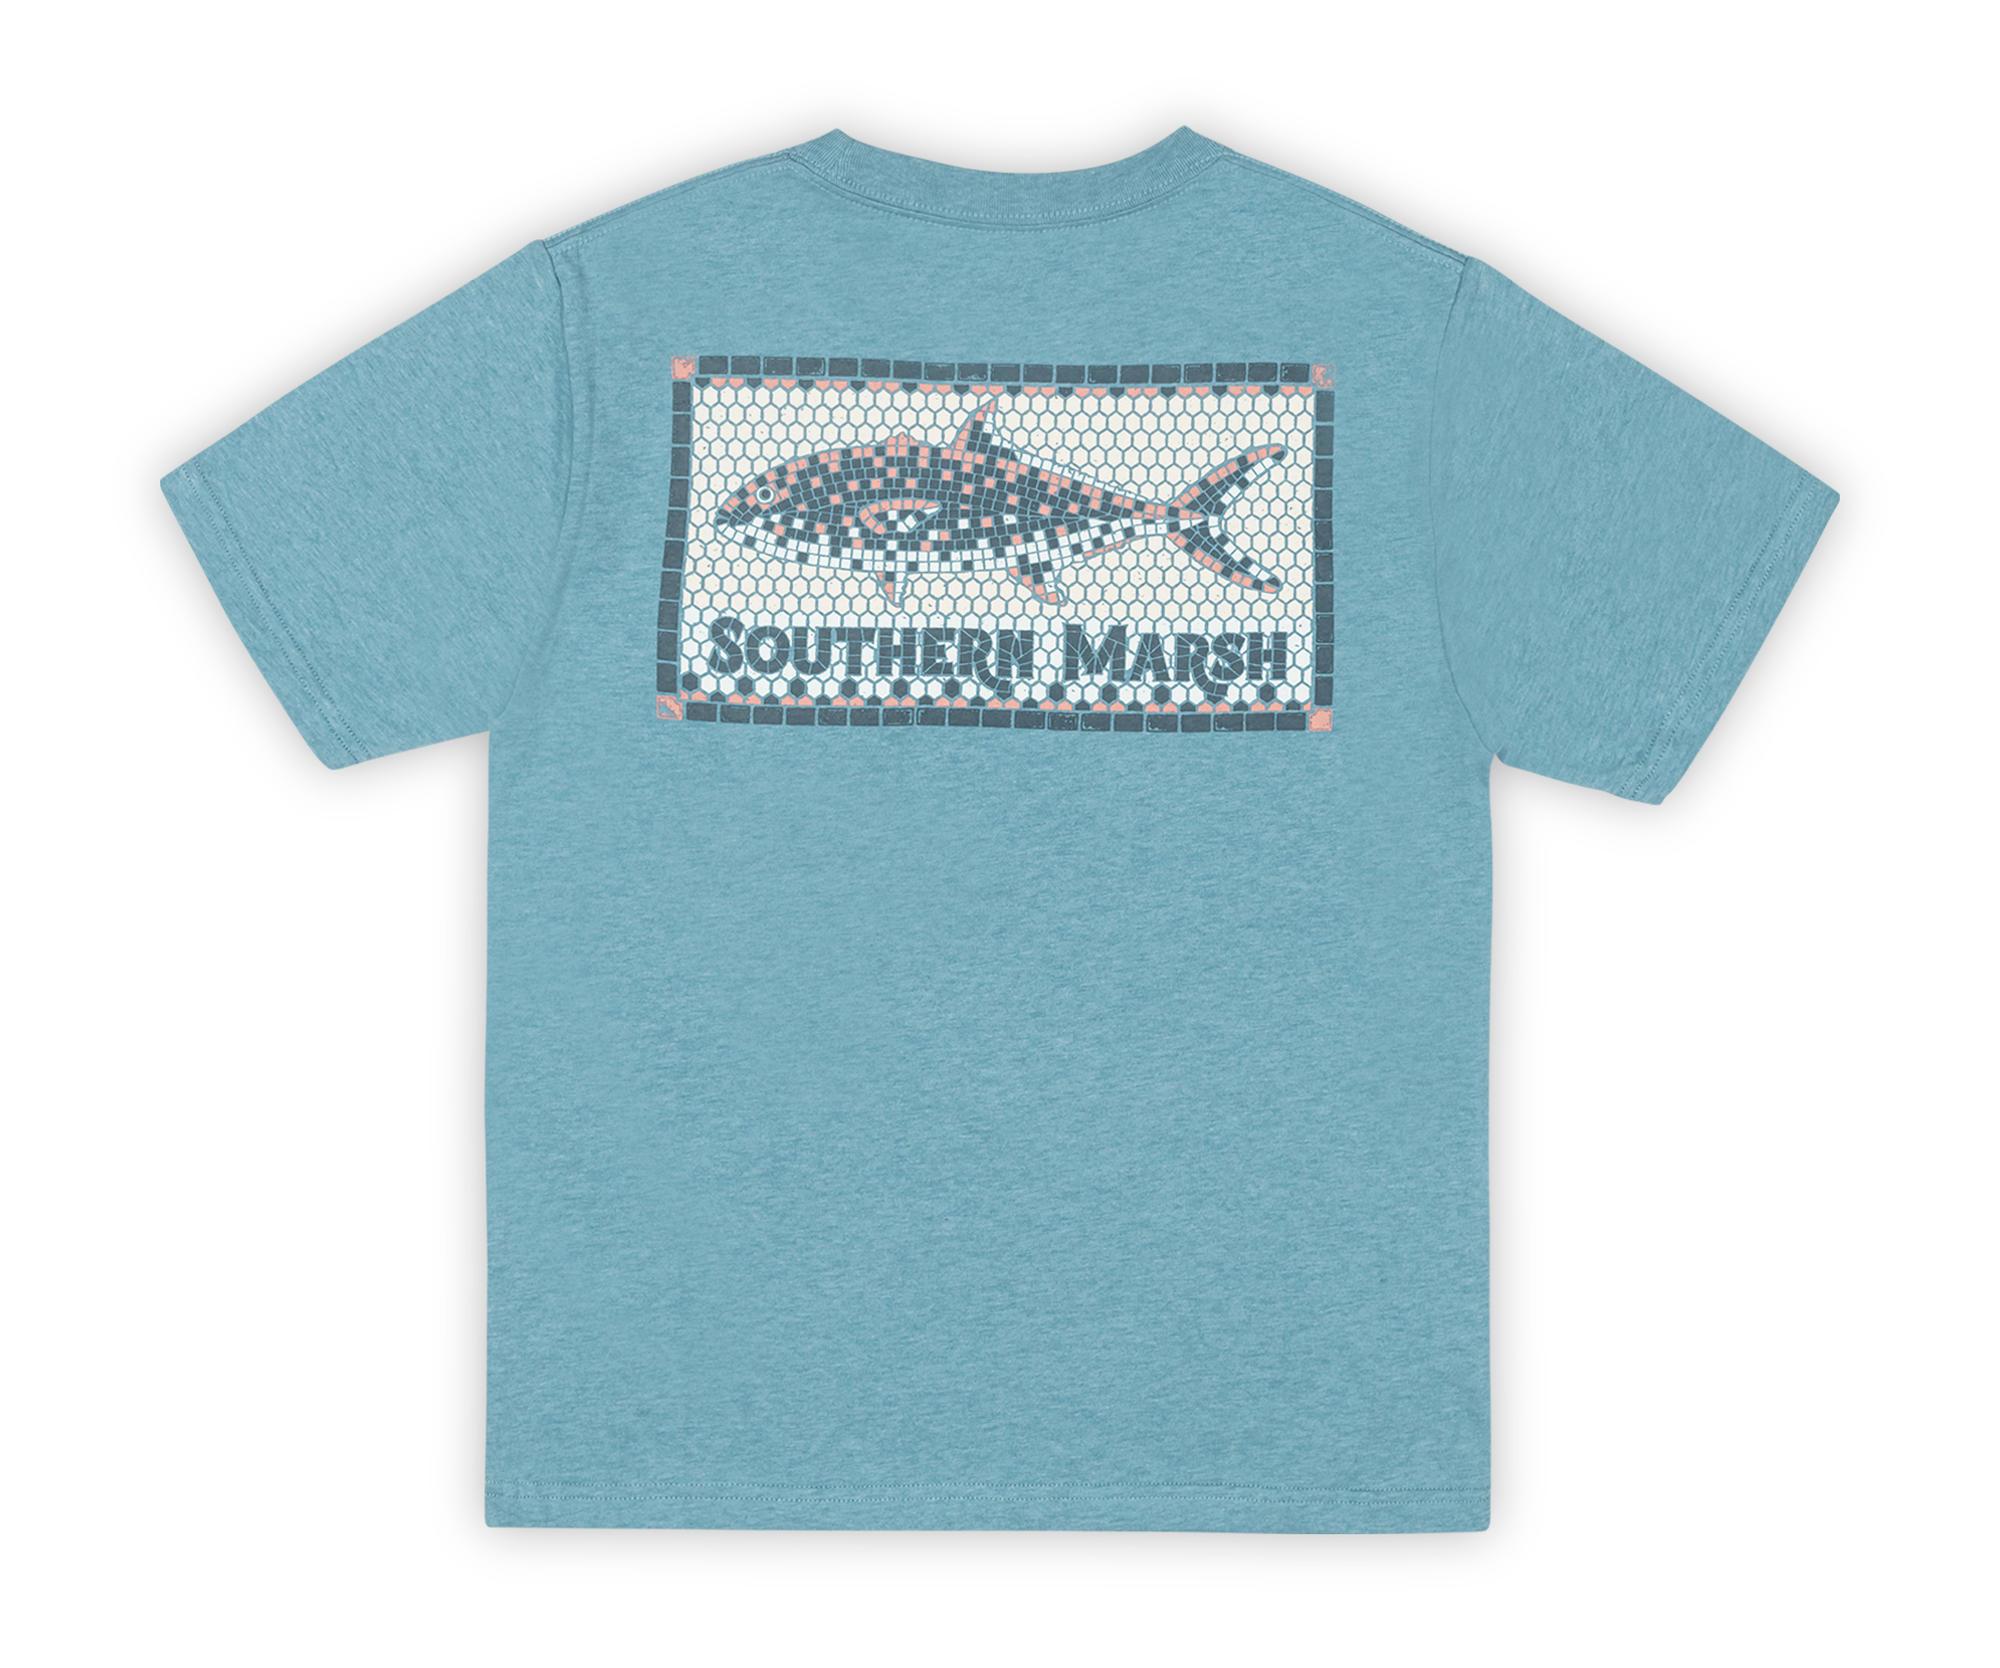 Southern Marsh Youth Tile Fish Tee